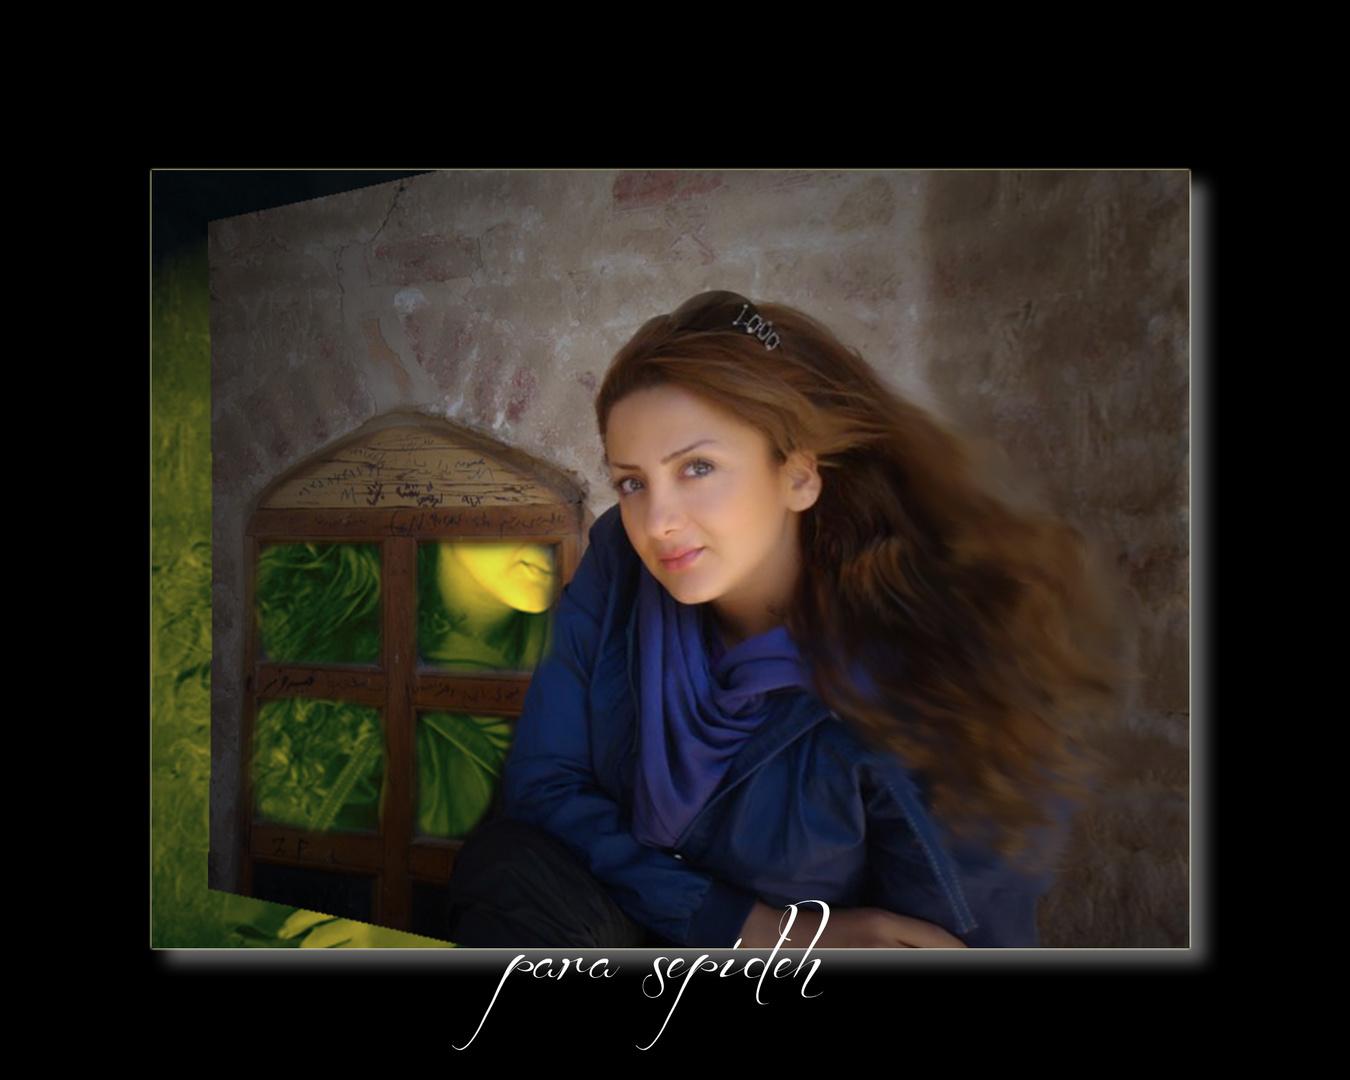 Perhsian girl